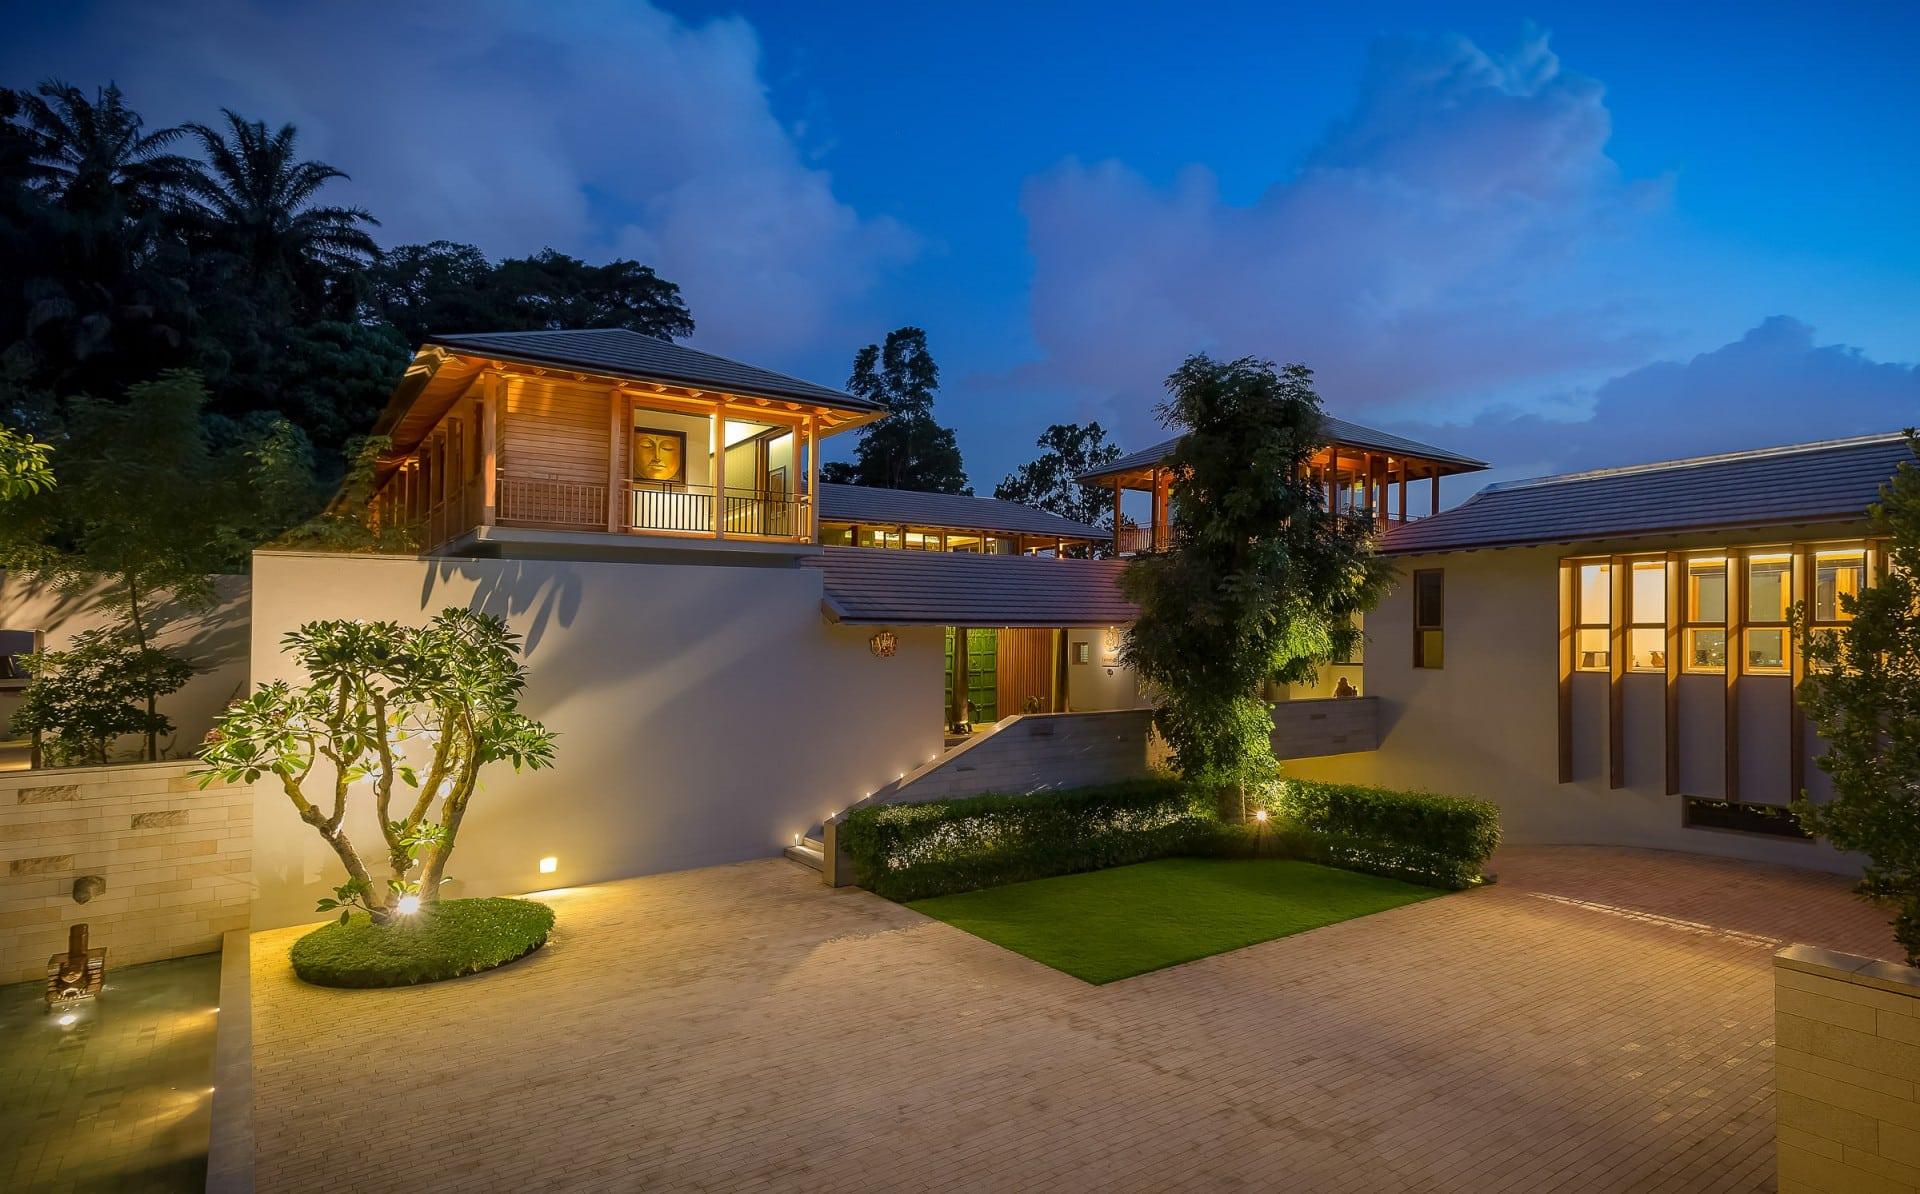 Best Architecture Photographer Malaysia   Luxury Home Facade Photography Kuala Lumpur